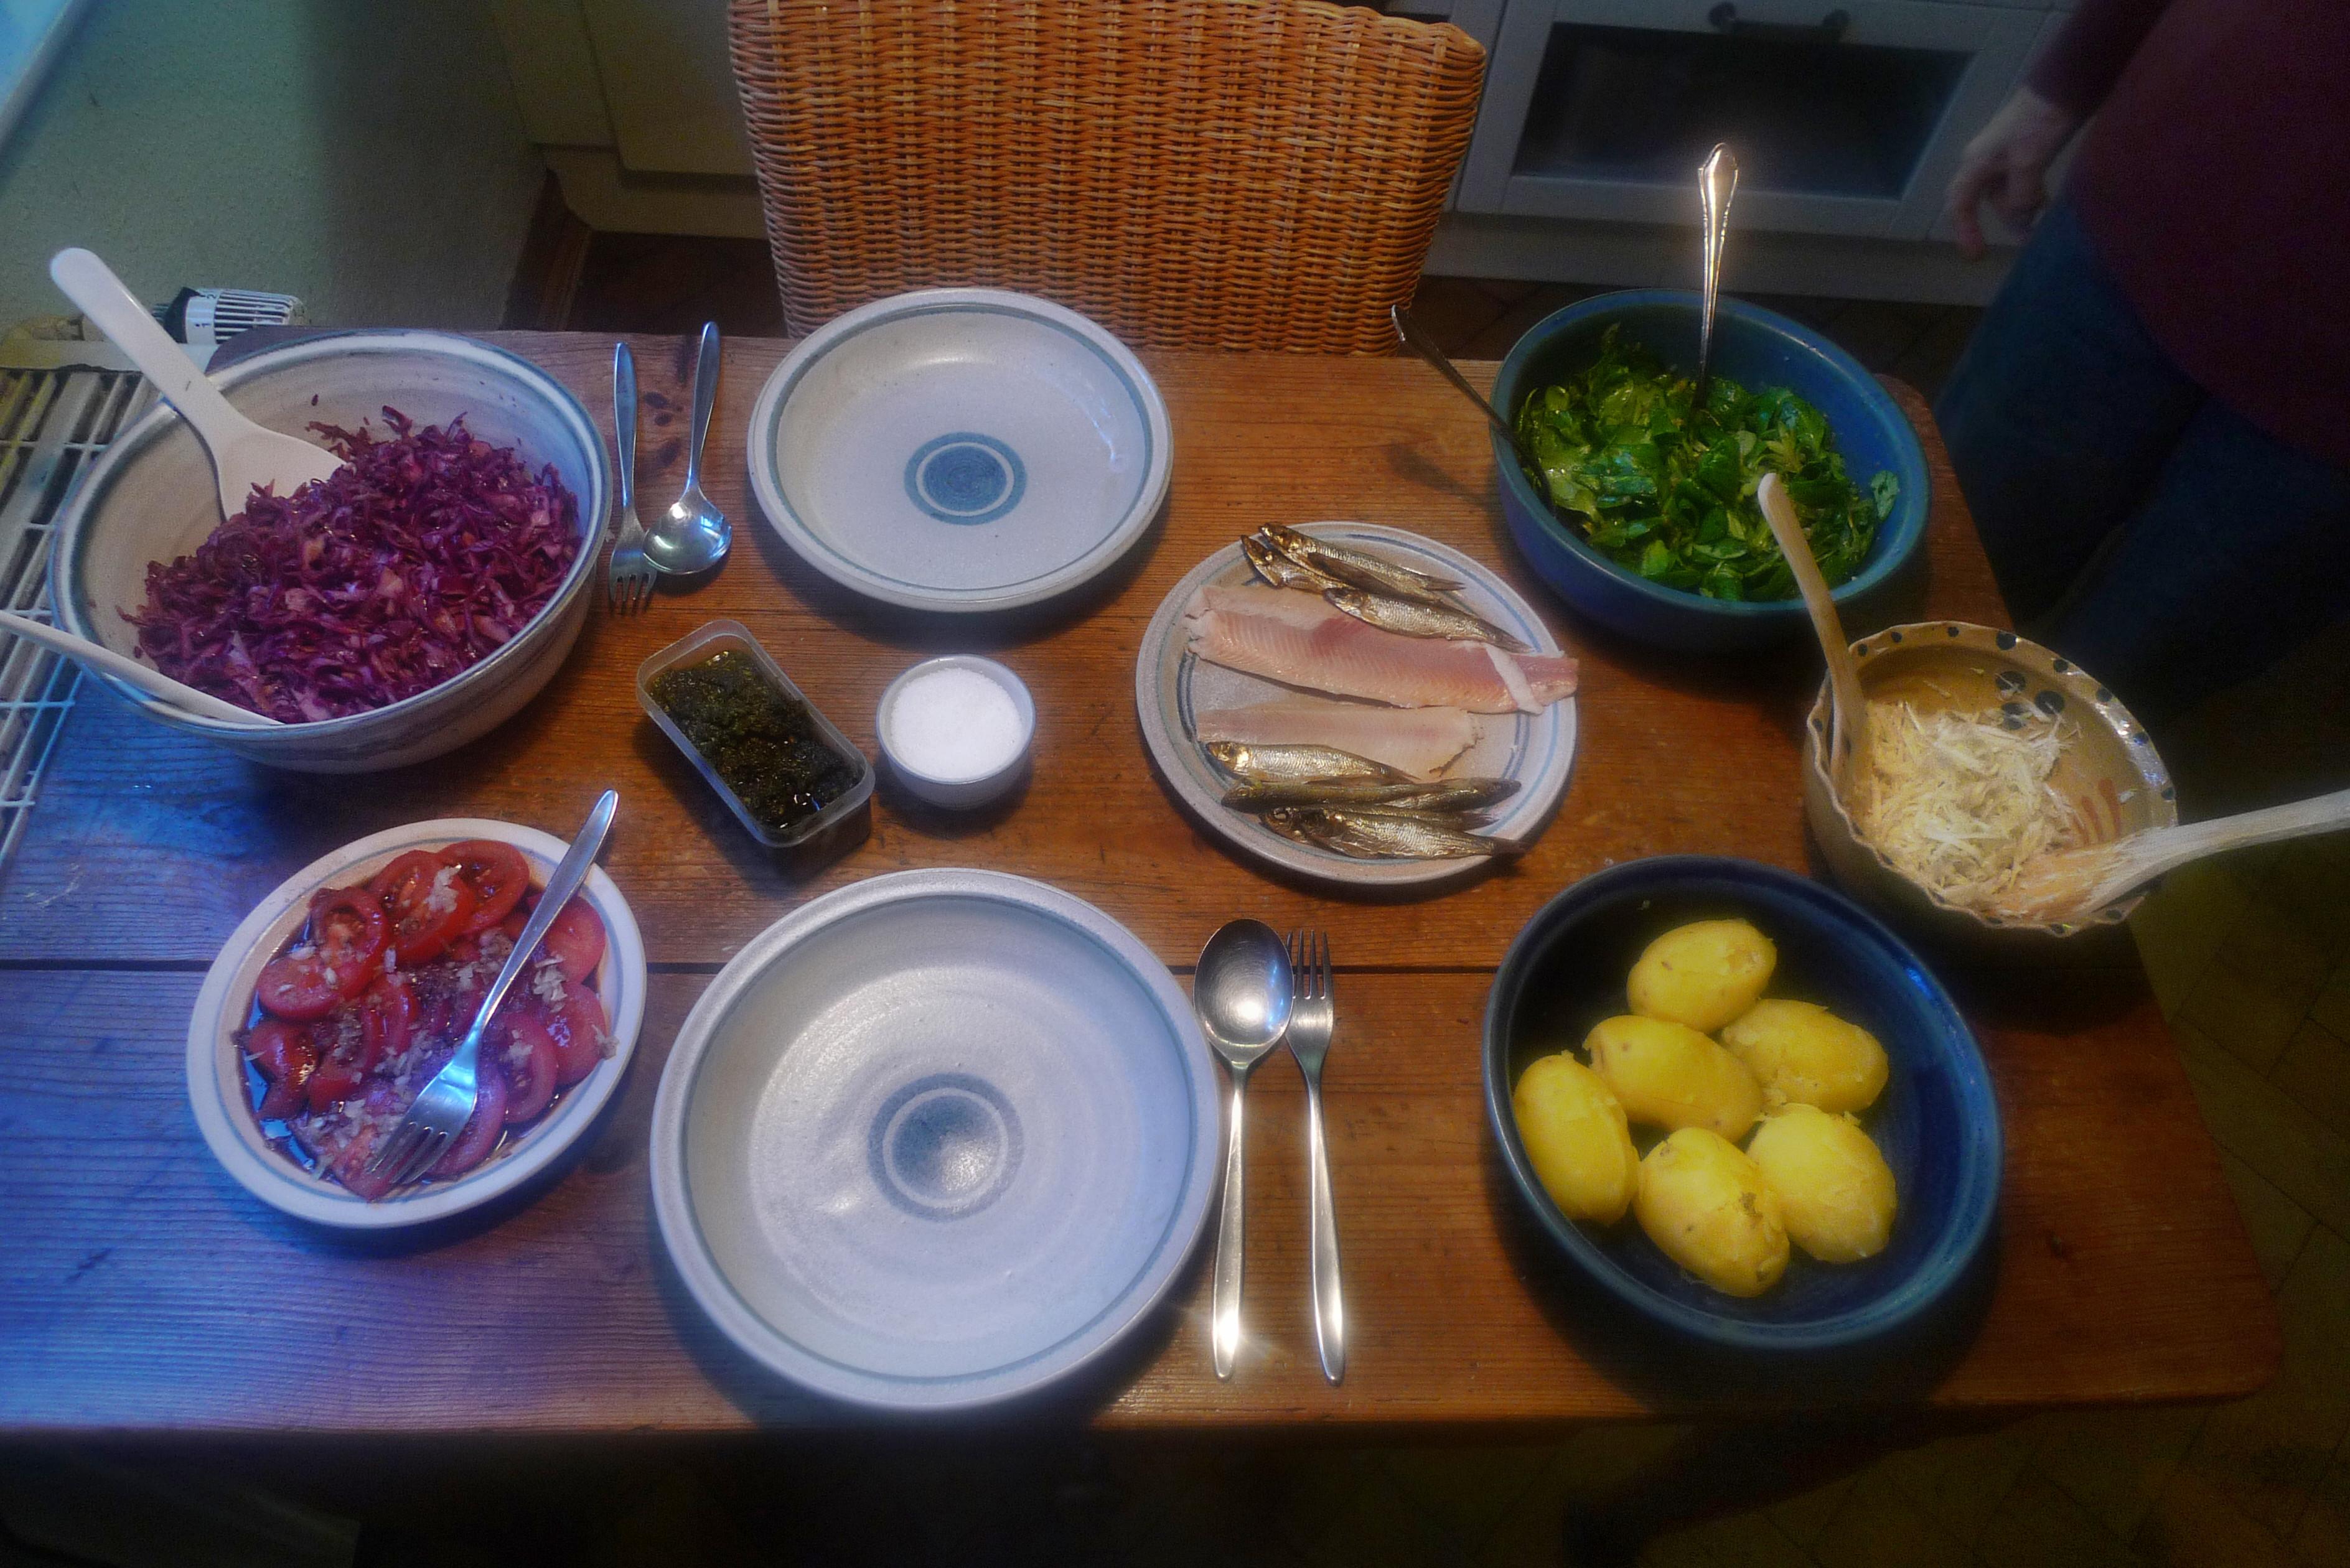 Foewllw-Salate-Kartoffeln-24.10-14   (6)